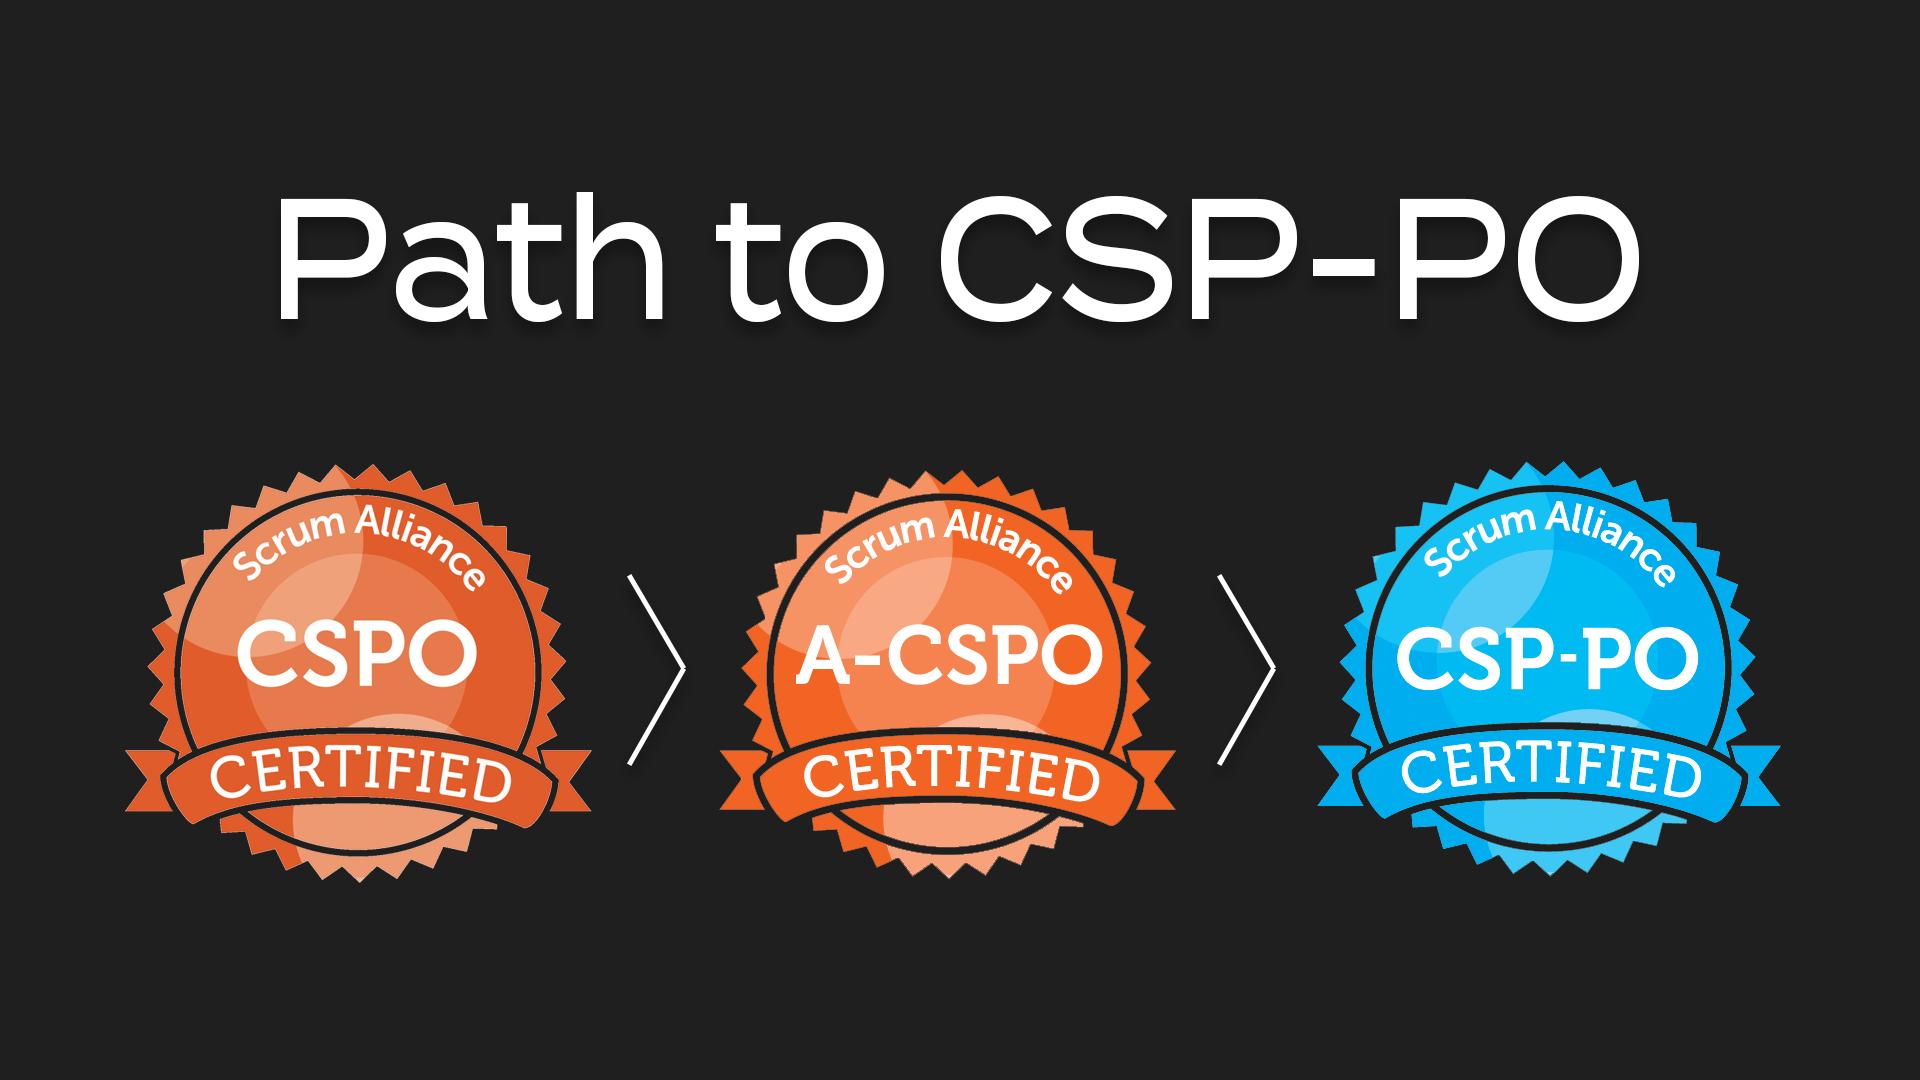 path to csp-po